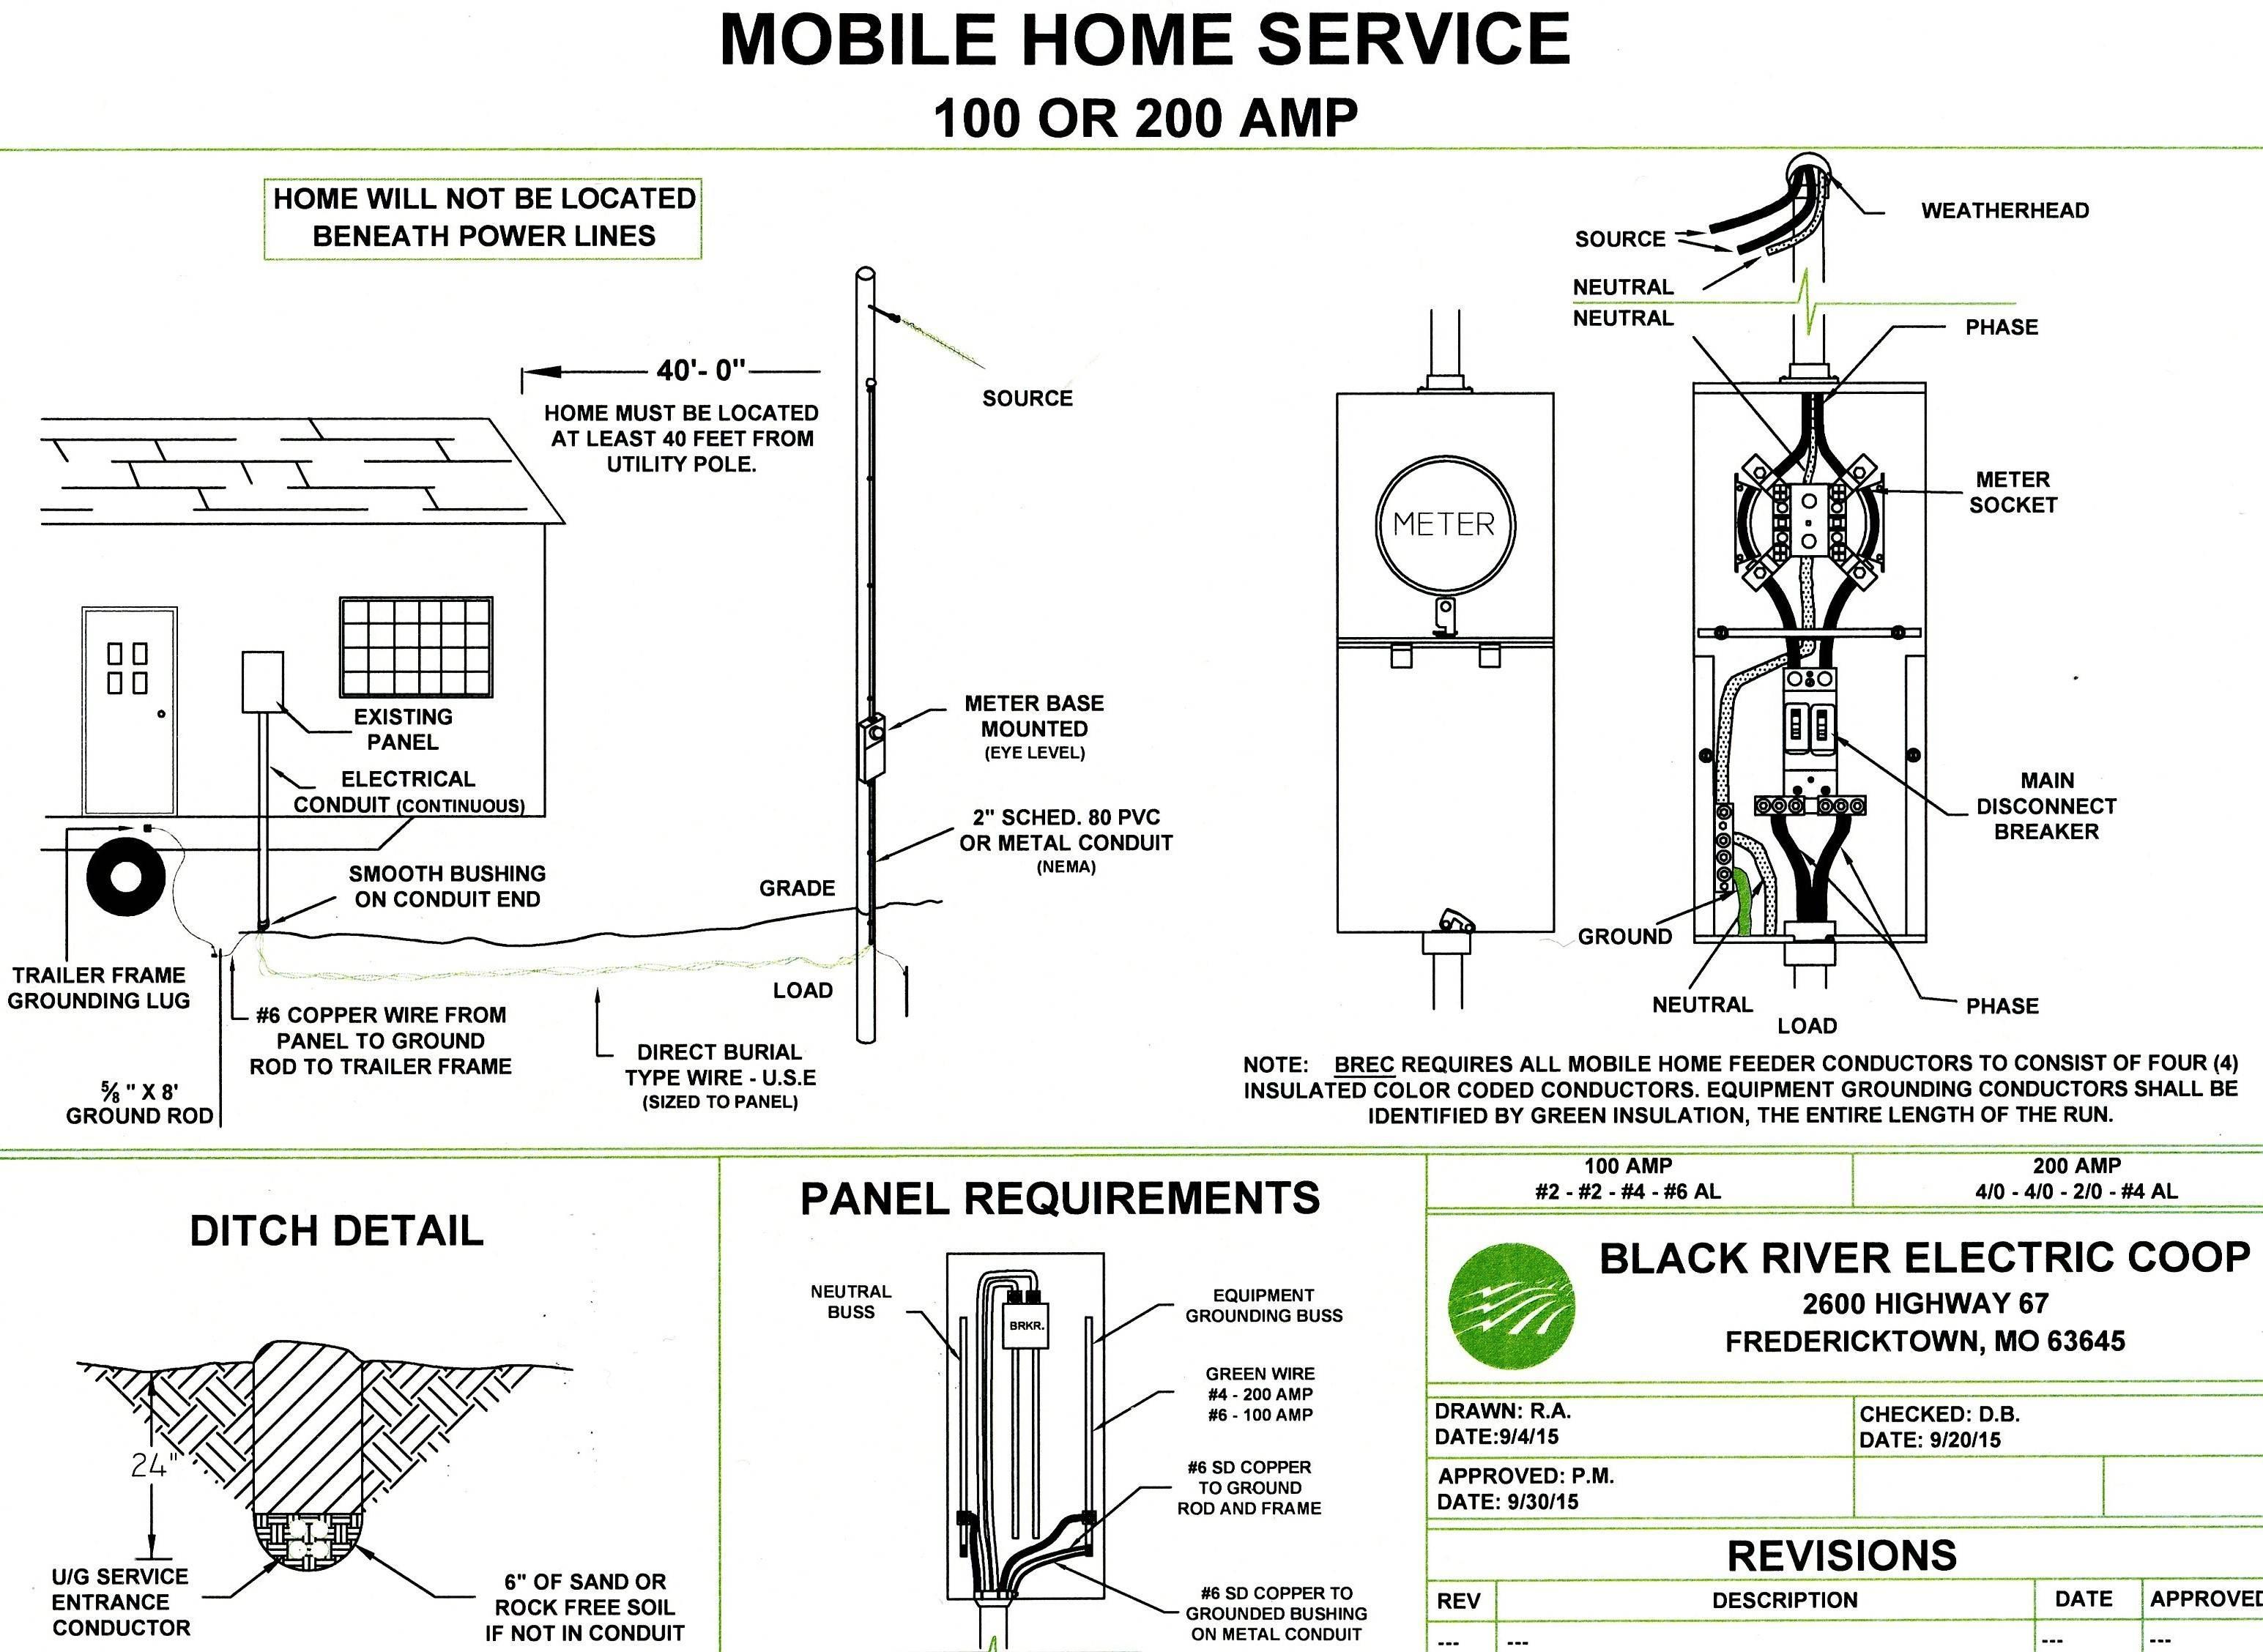 Diagram Toyota Service Wiring Diagram Full Version Hd Quality Wiring Diagram Diagramsfae Caditwergi It